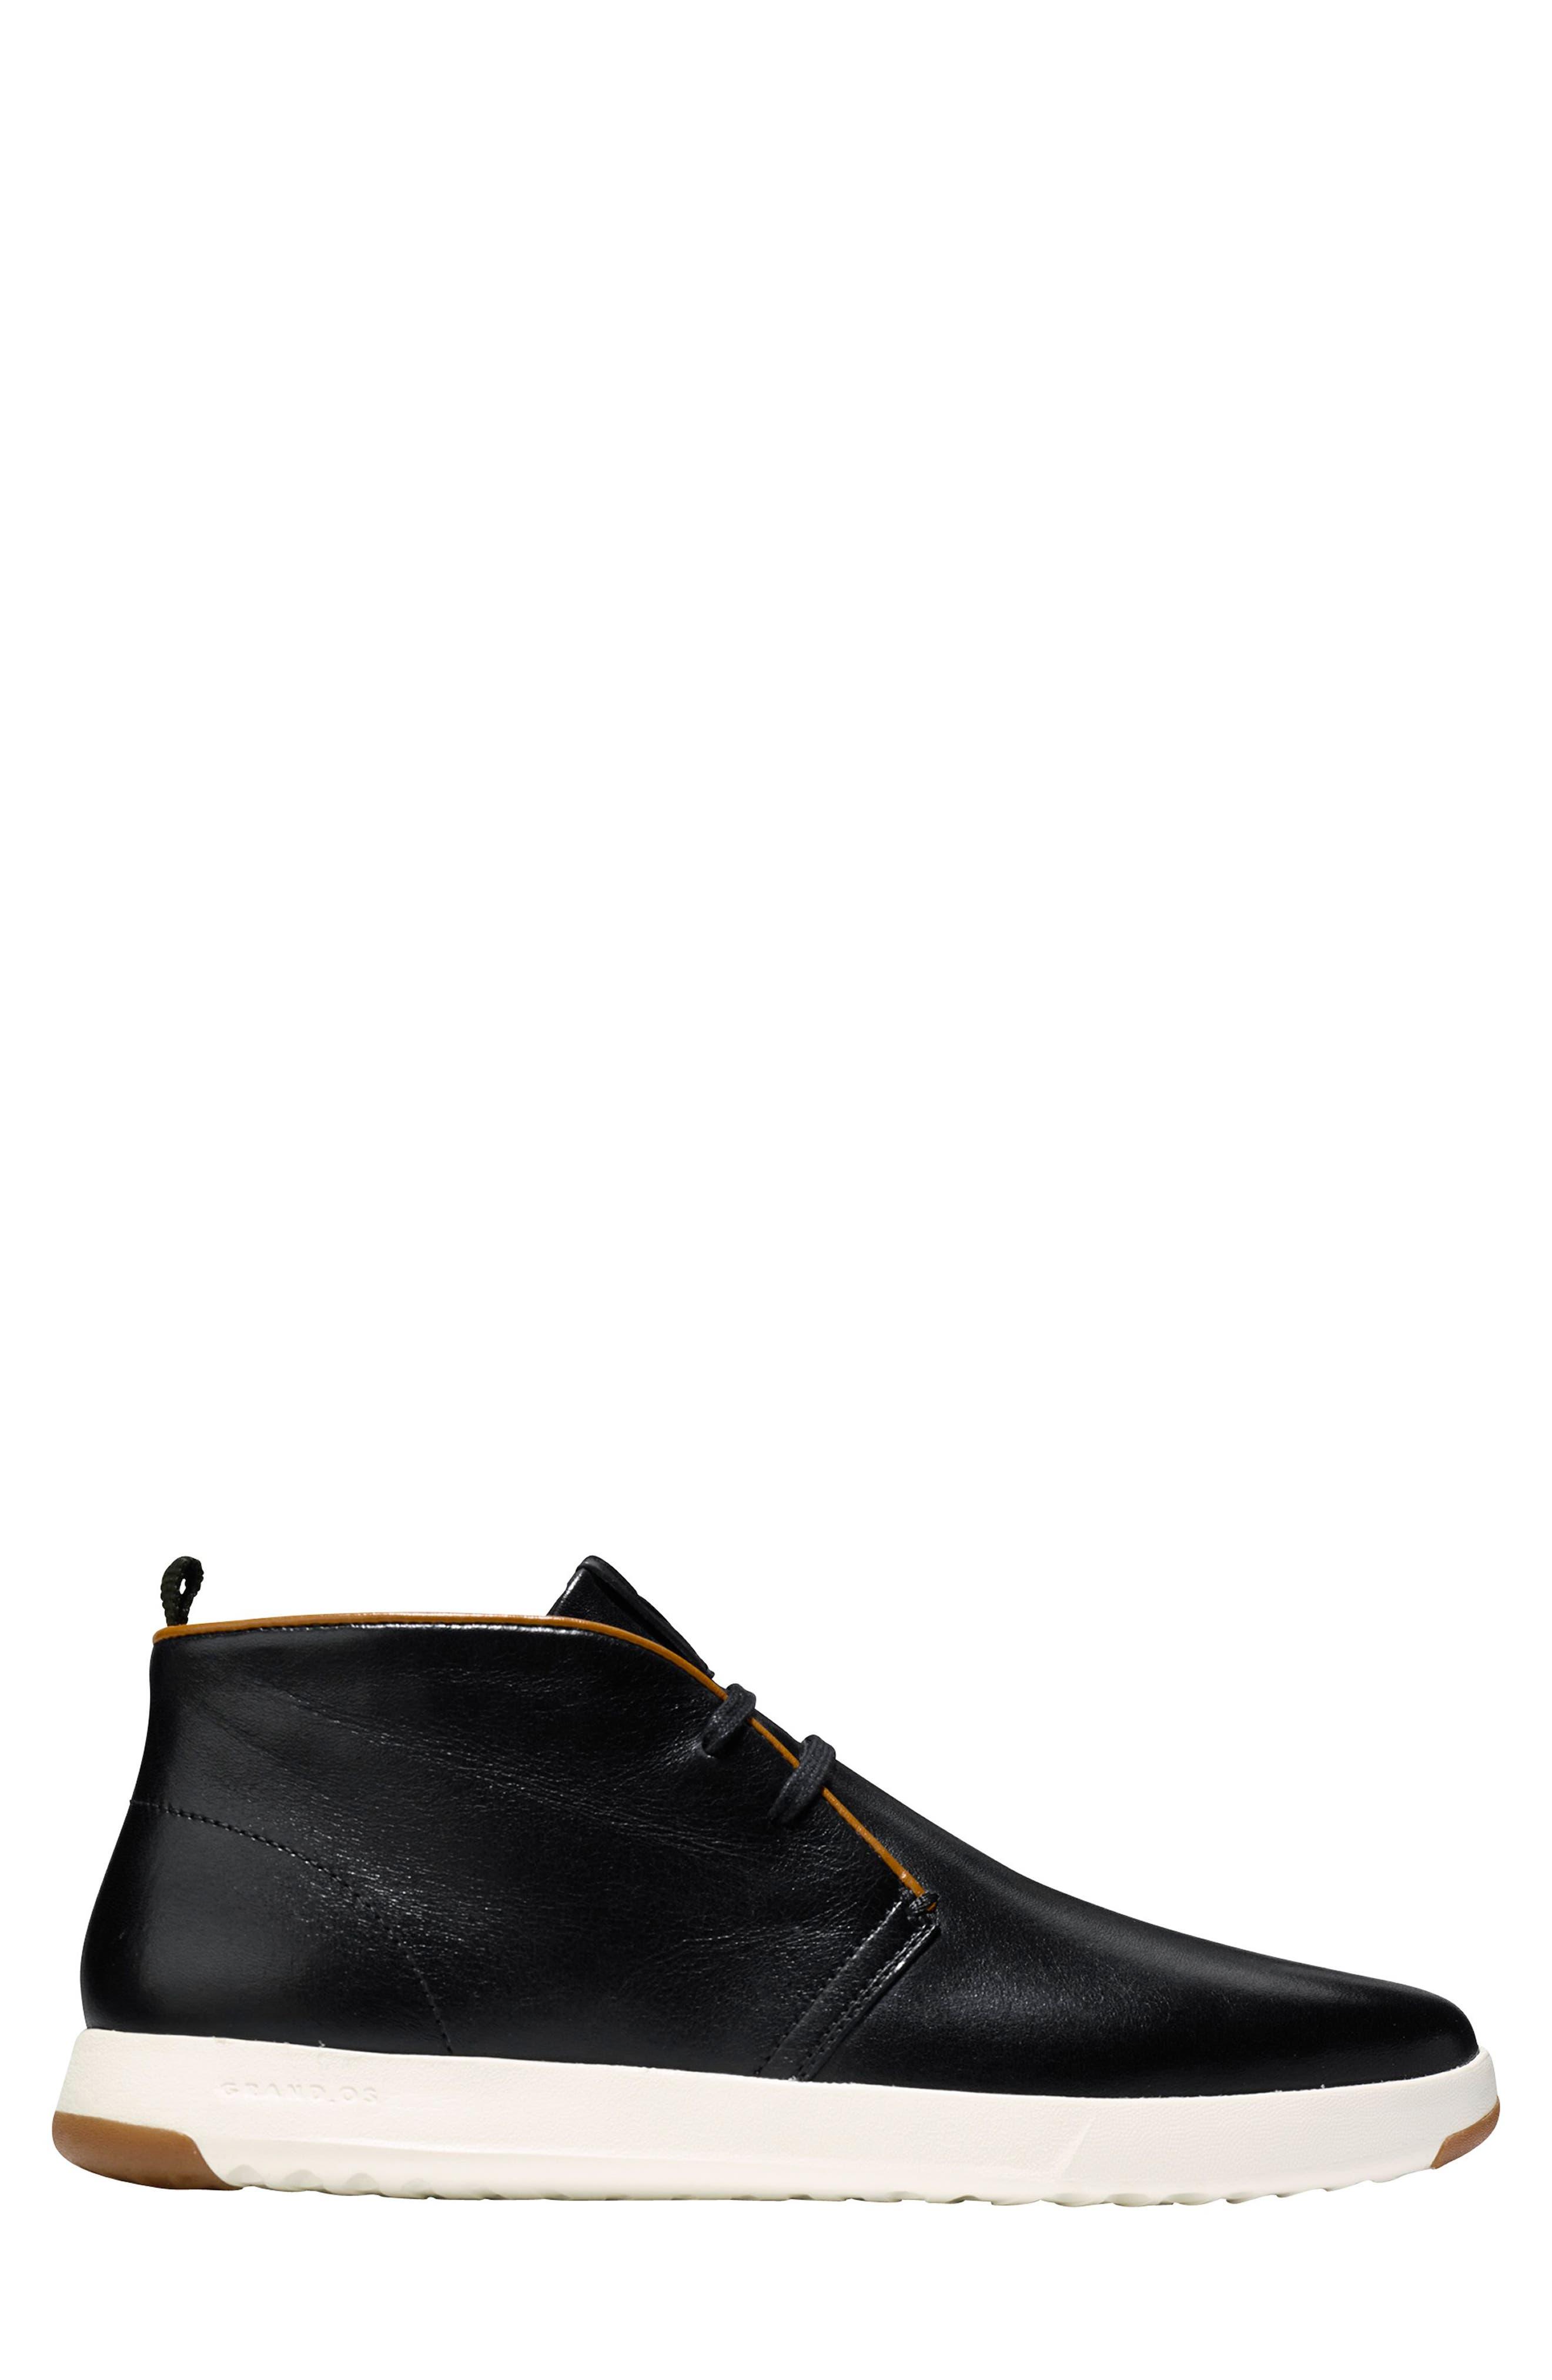 GrandPro Chukka Boot,                             Alternate thumbnail 3, color,                             BLACK/ WHITE LEATHER